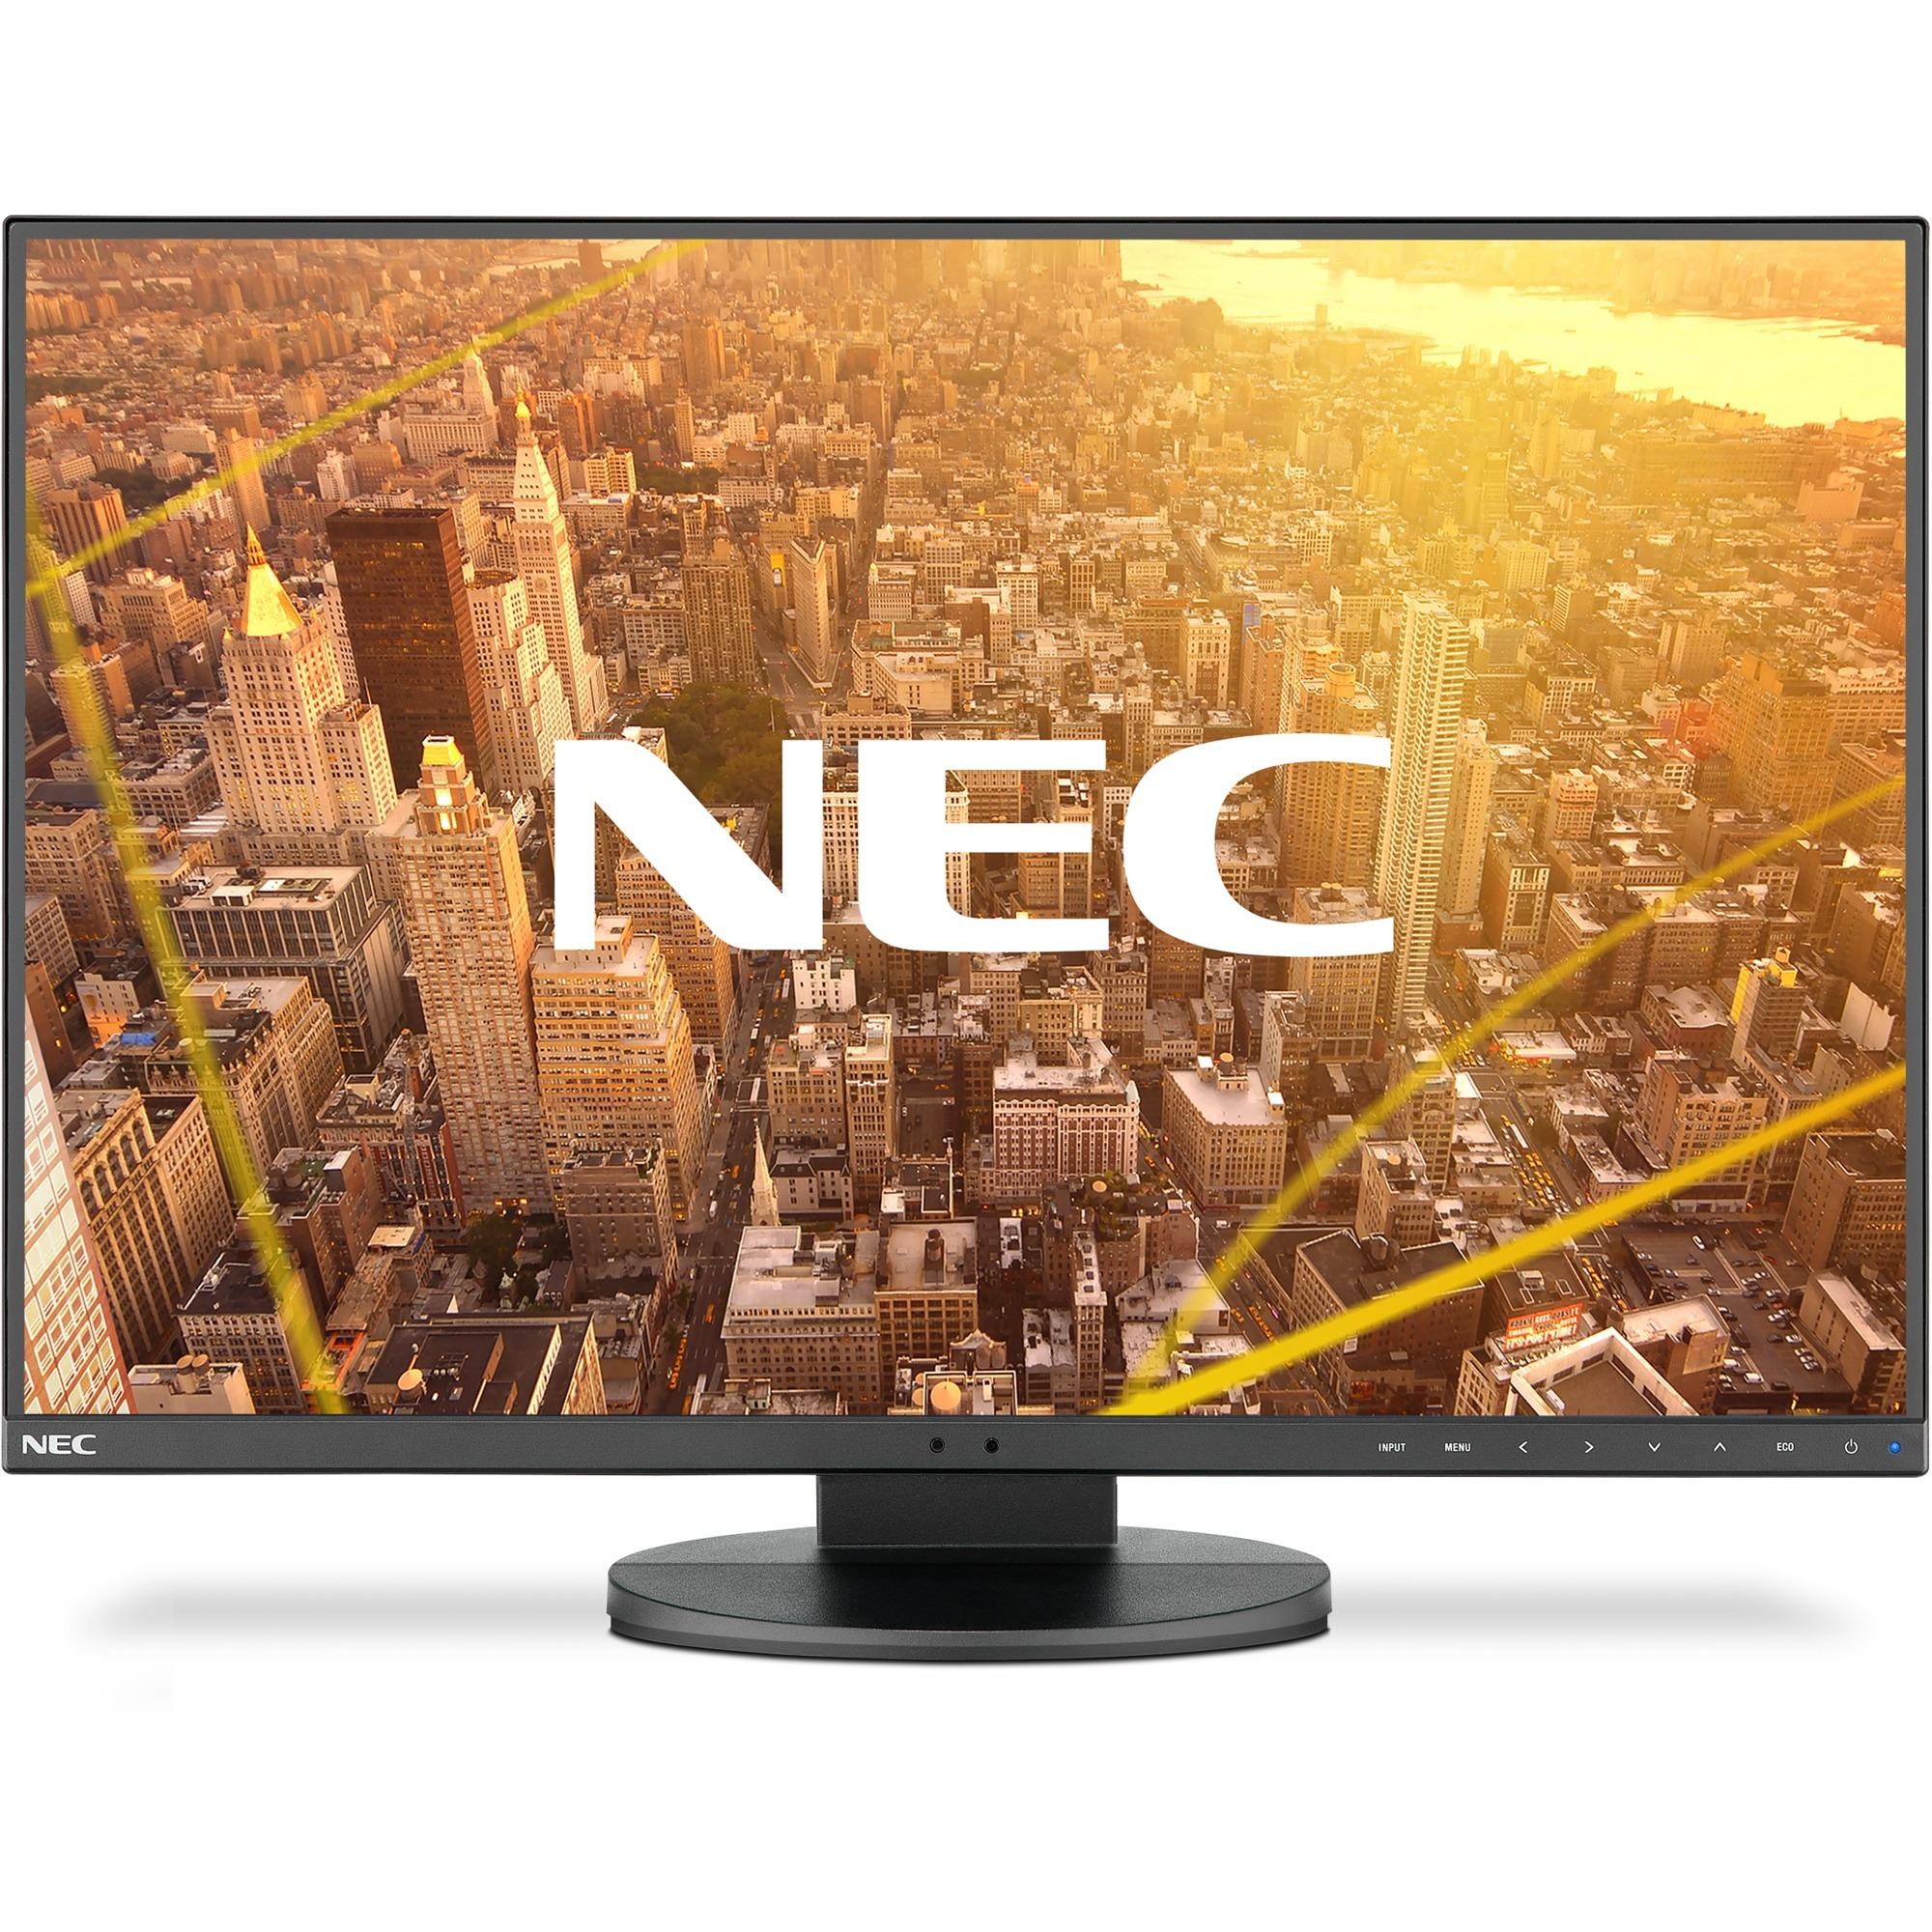 "MultiSync EA245WMi-2 pantalla para PC 61 cm (24"") WUXGA LED Plana Negro, Monitor LED"